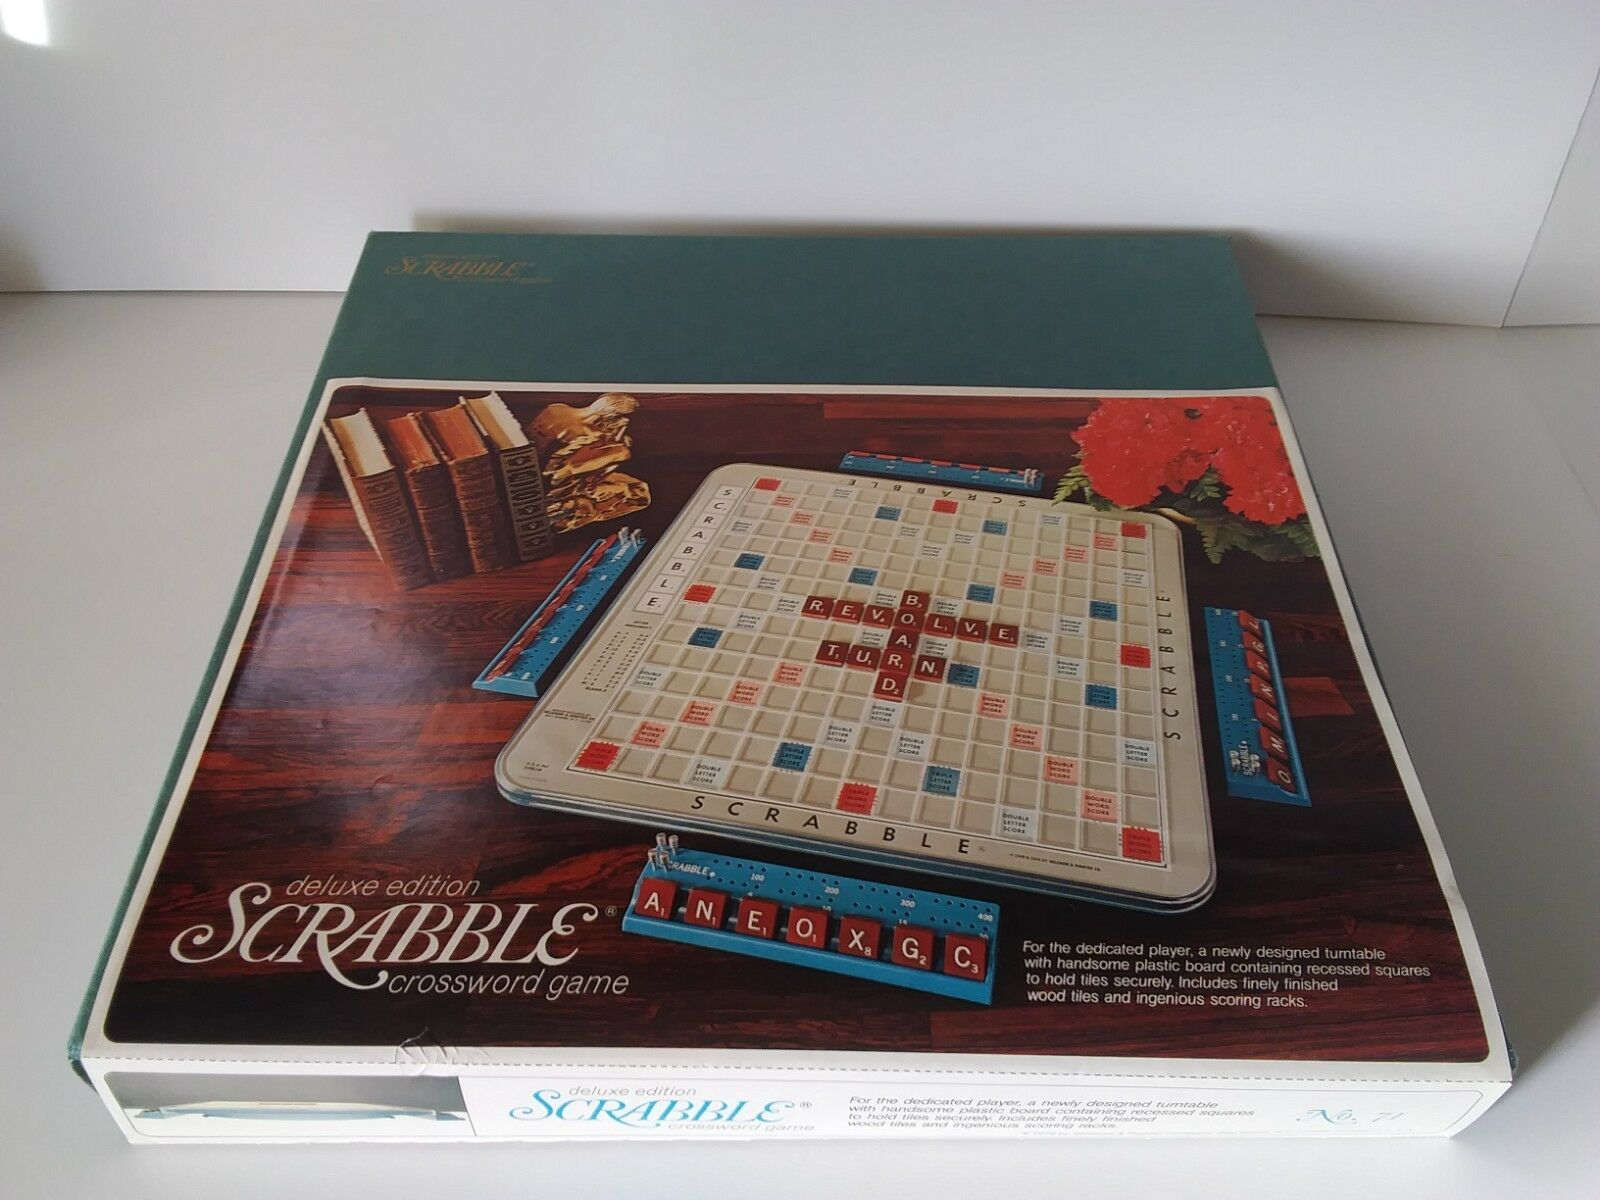 Jahrgang 1972 deluxe edition ein brettspiel scrabble - drehscheibe zu 100% abgeschlossen